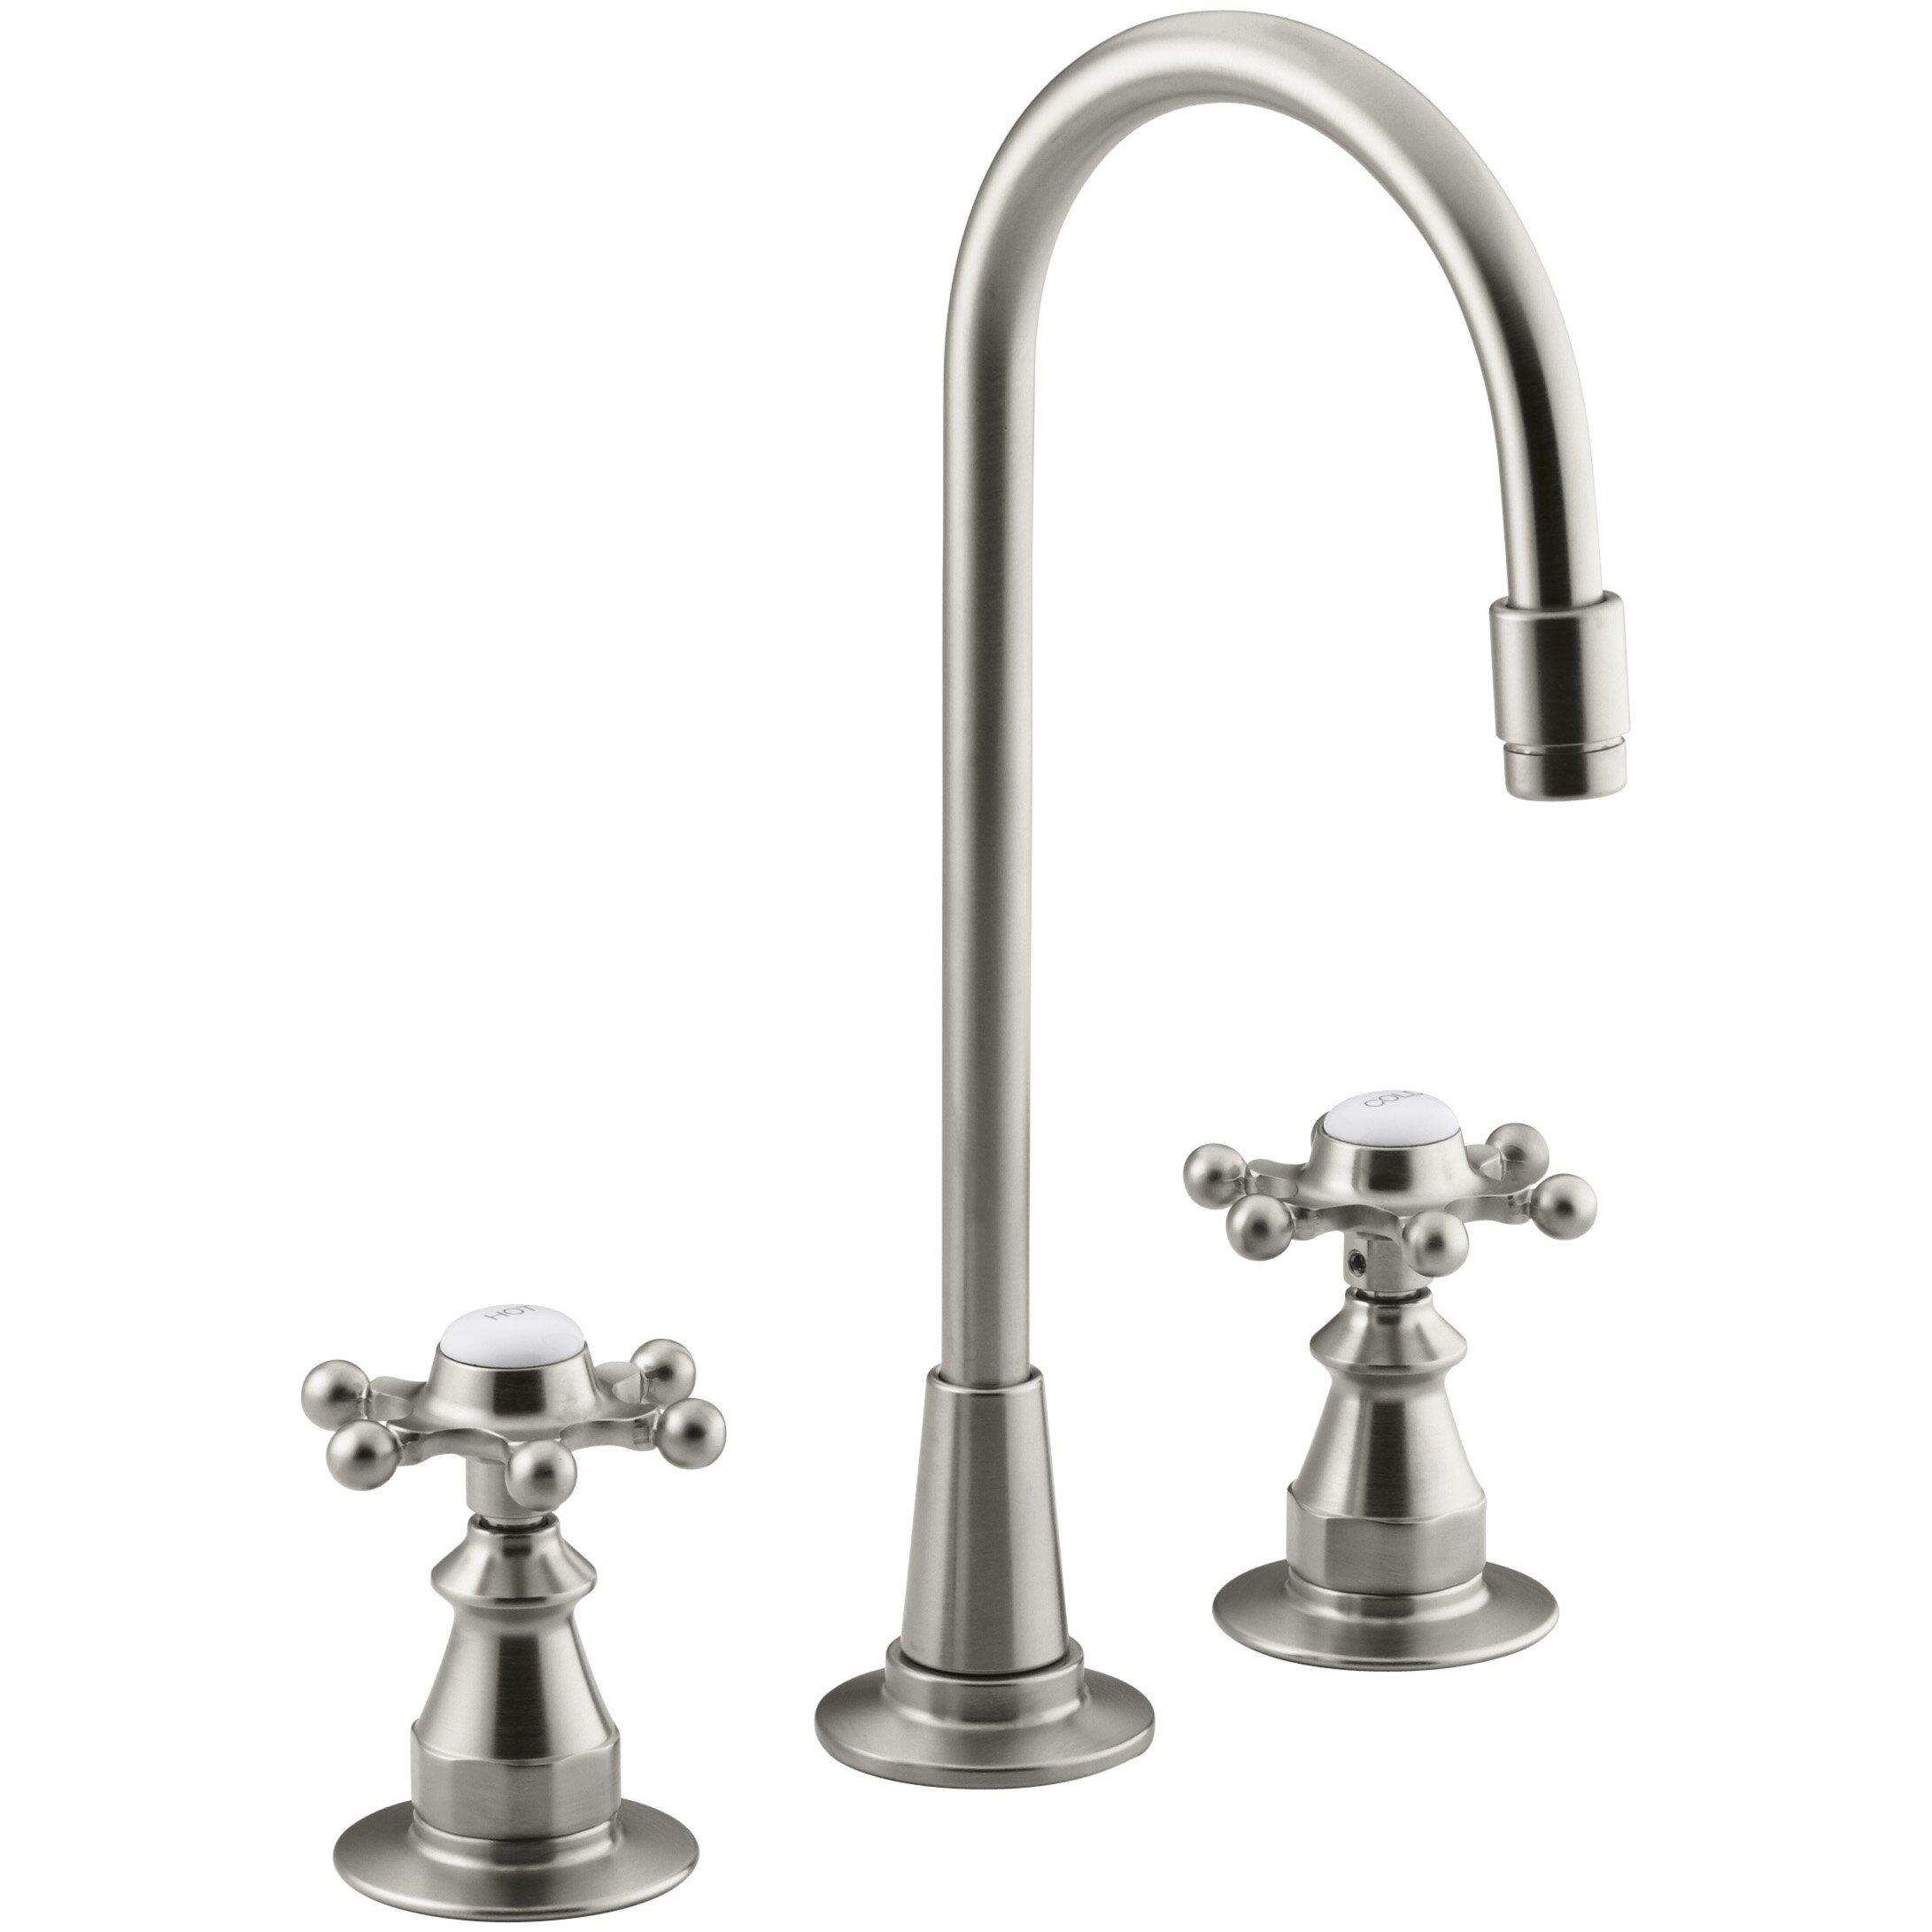 Kohler Bar Sink Faucet : Kohler Antique Three-Hole Bar Sink Faucet with 6-Prong Handles